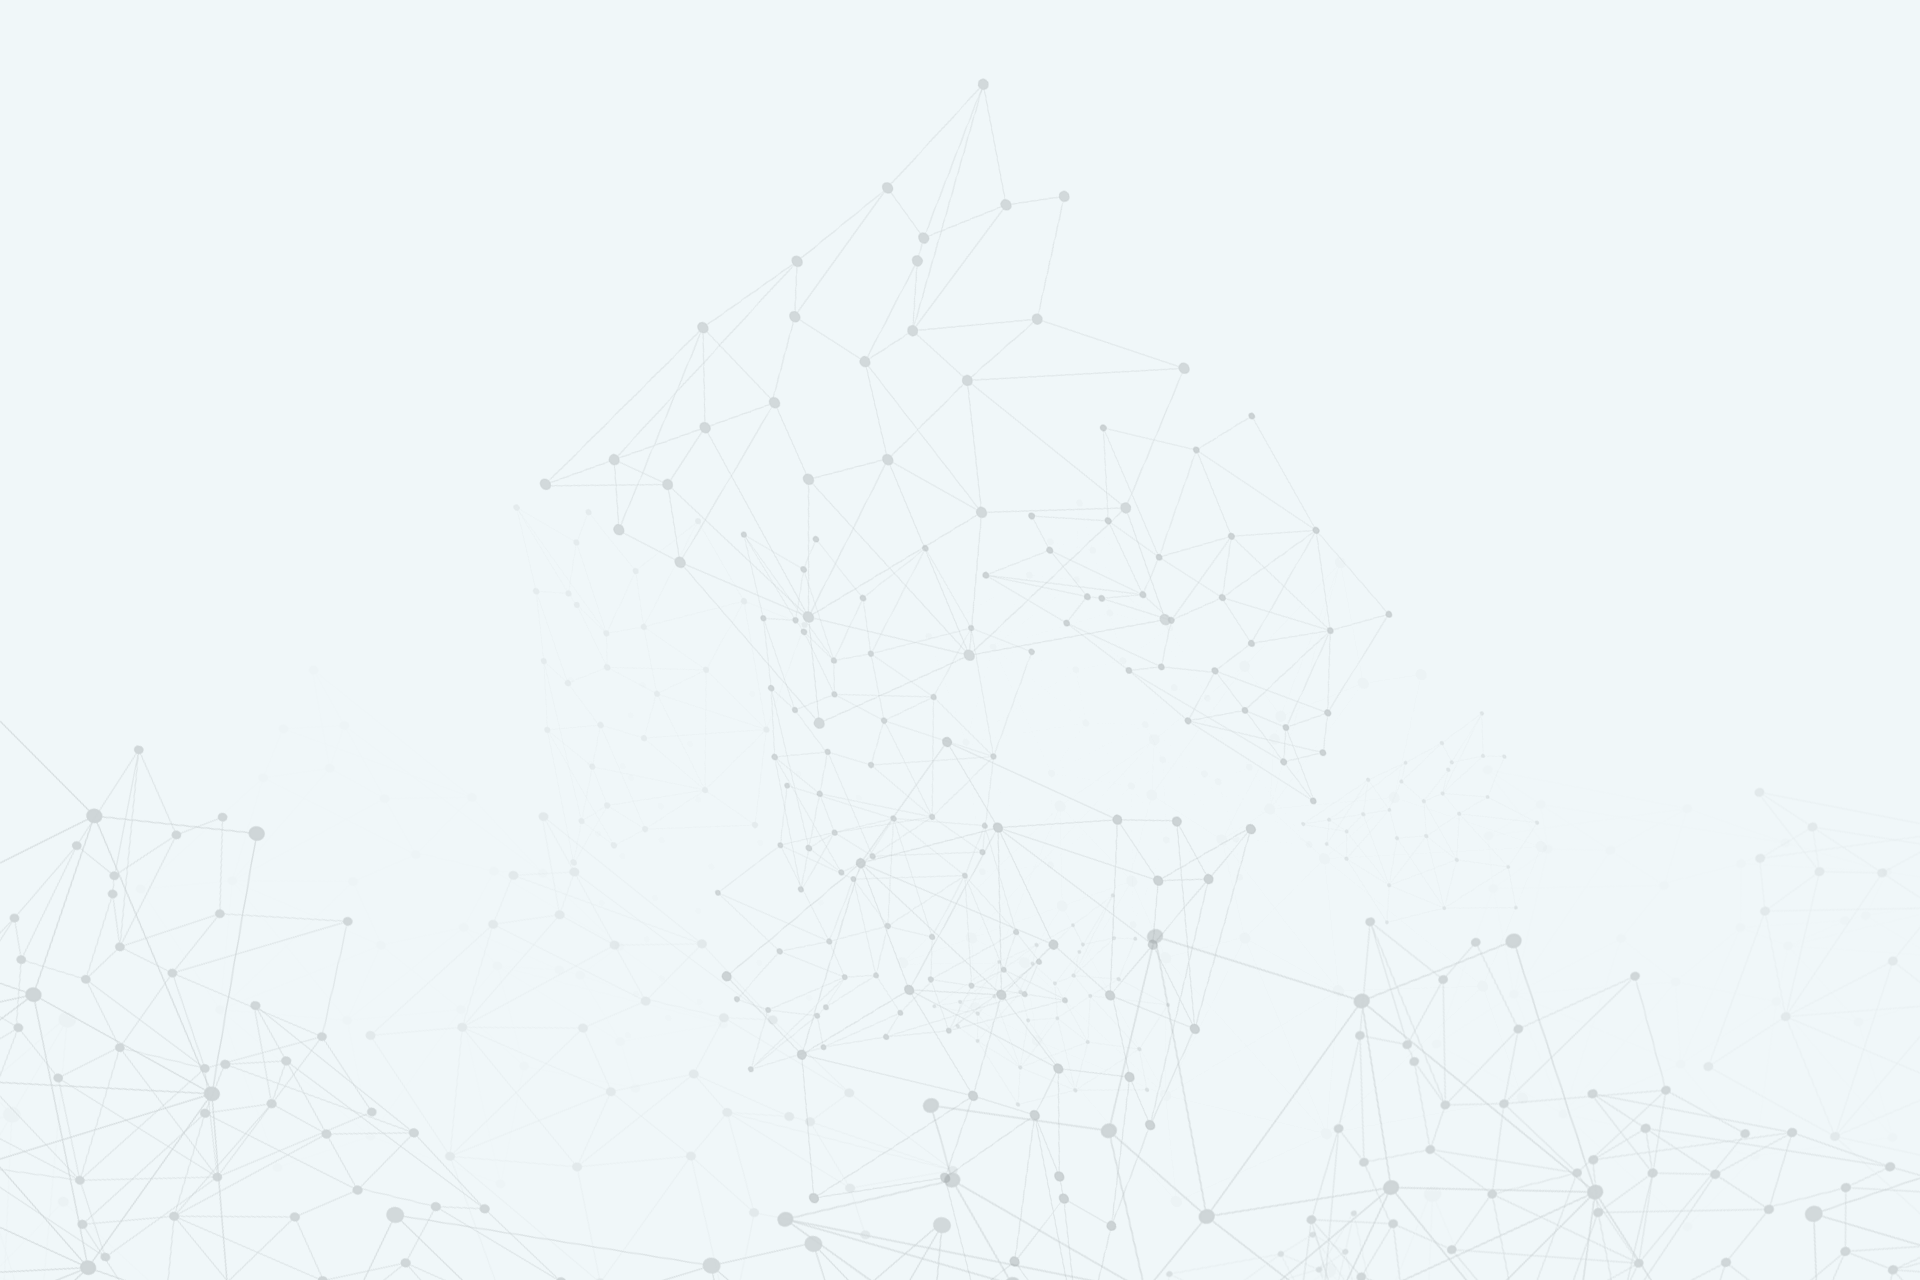 fondo-puntos-blanco-diplomado-seo